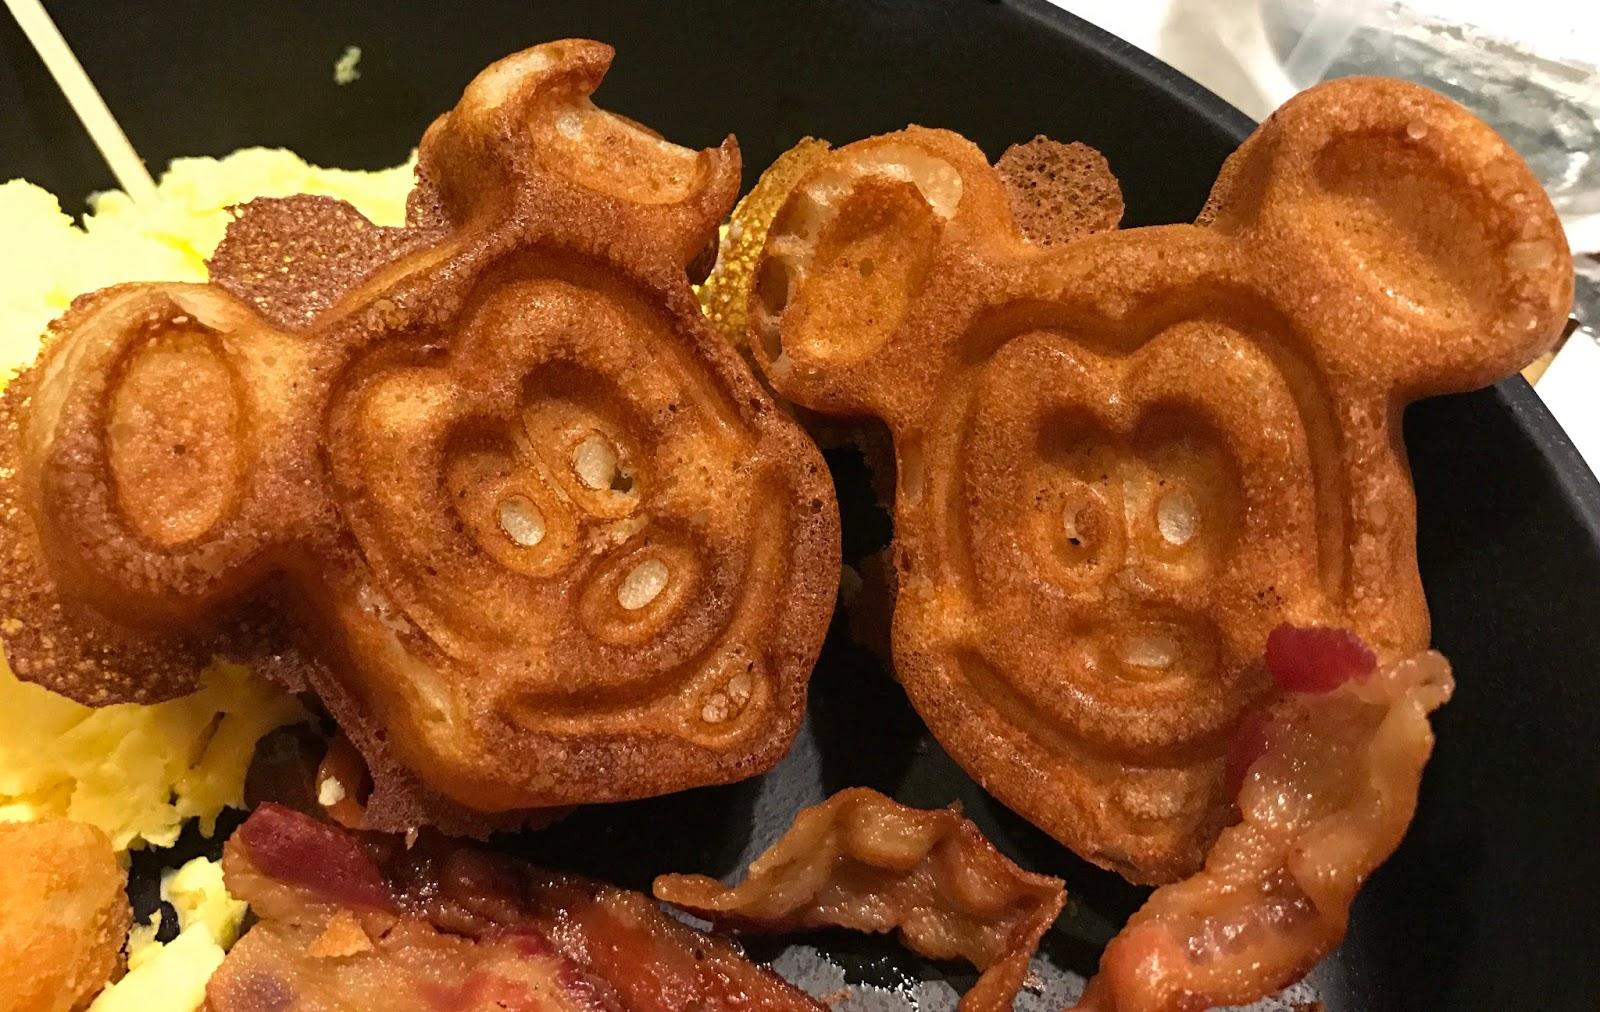 Alexis\'s Gluten Free Adventures: The Garden Grill Breakfast - Epcot